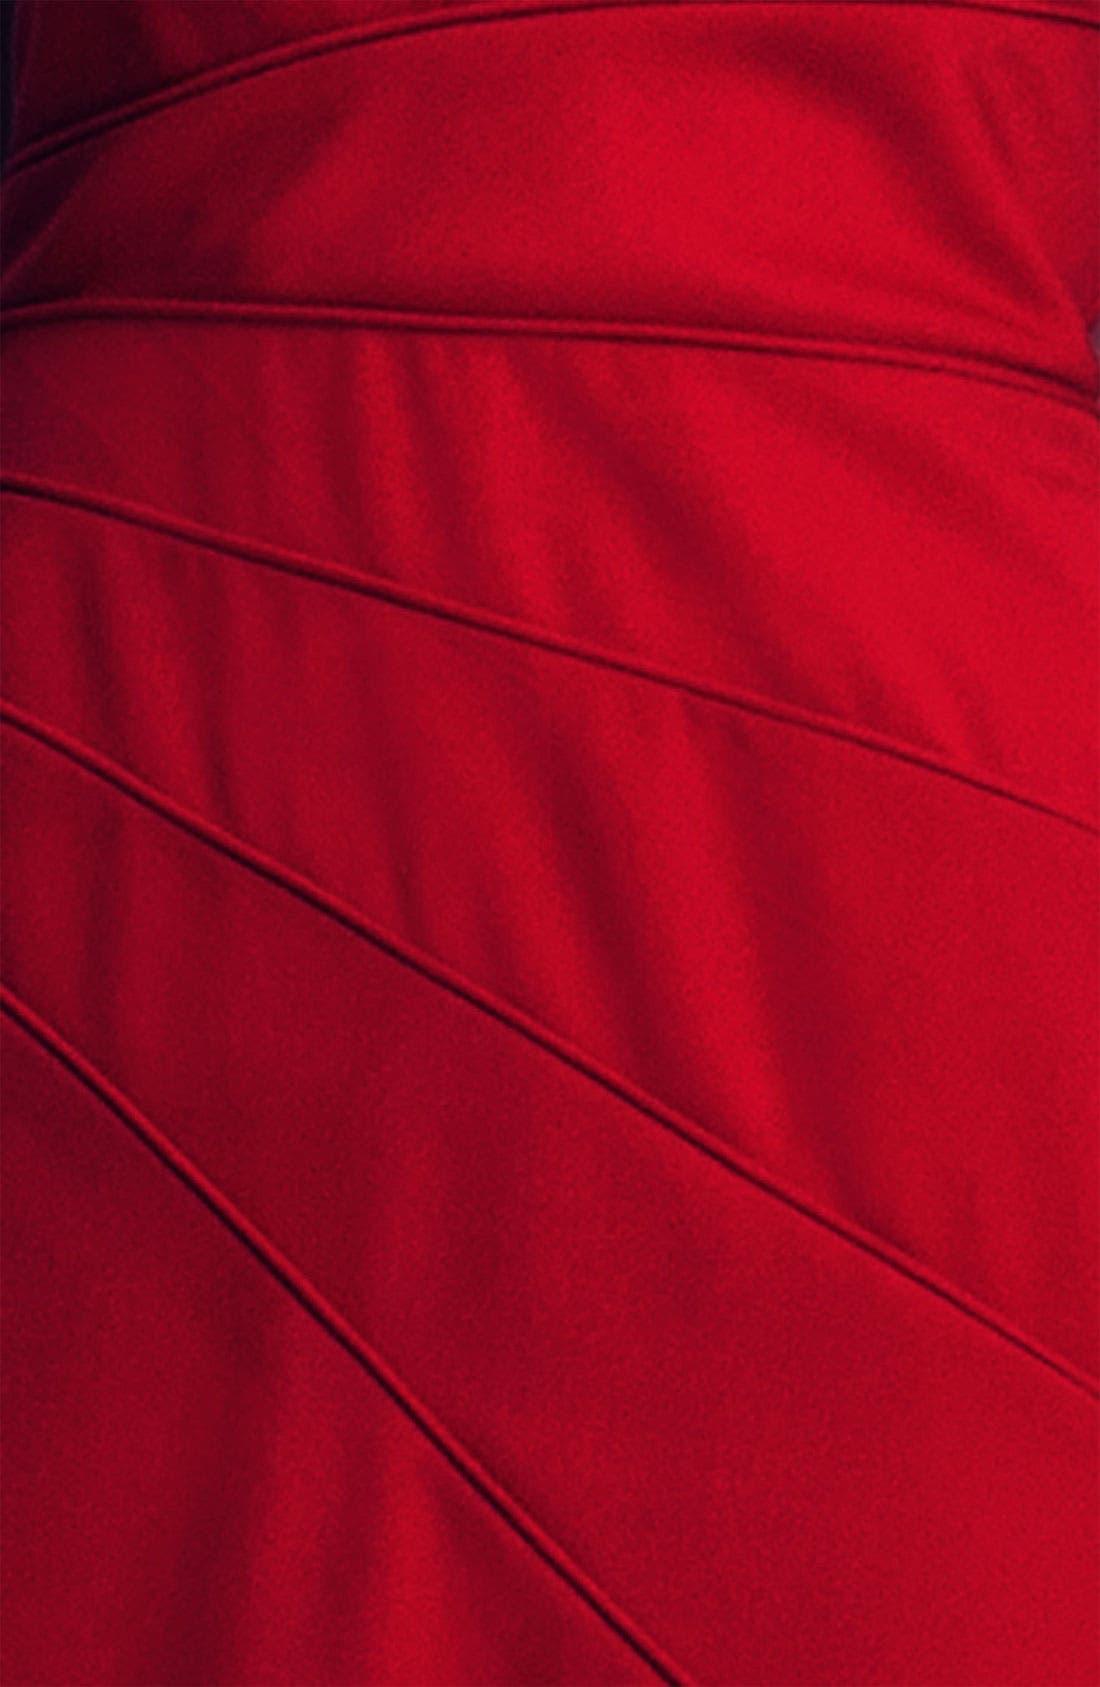 Sheath Dress,                             Alternate thumbnail 2, color,                             620